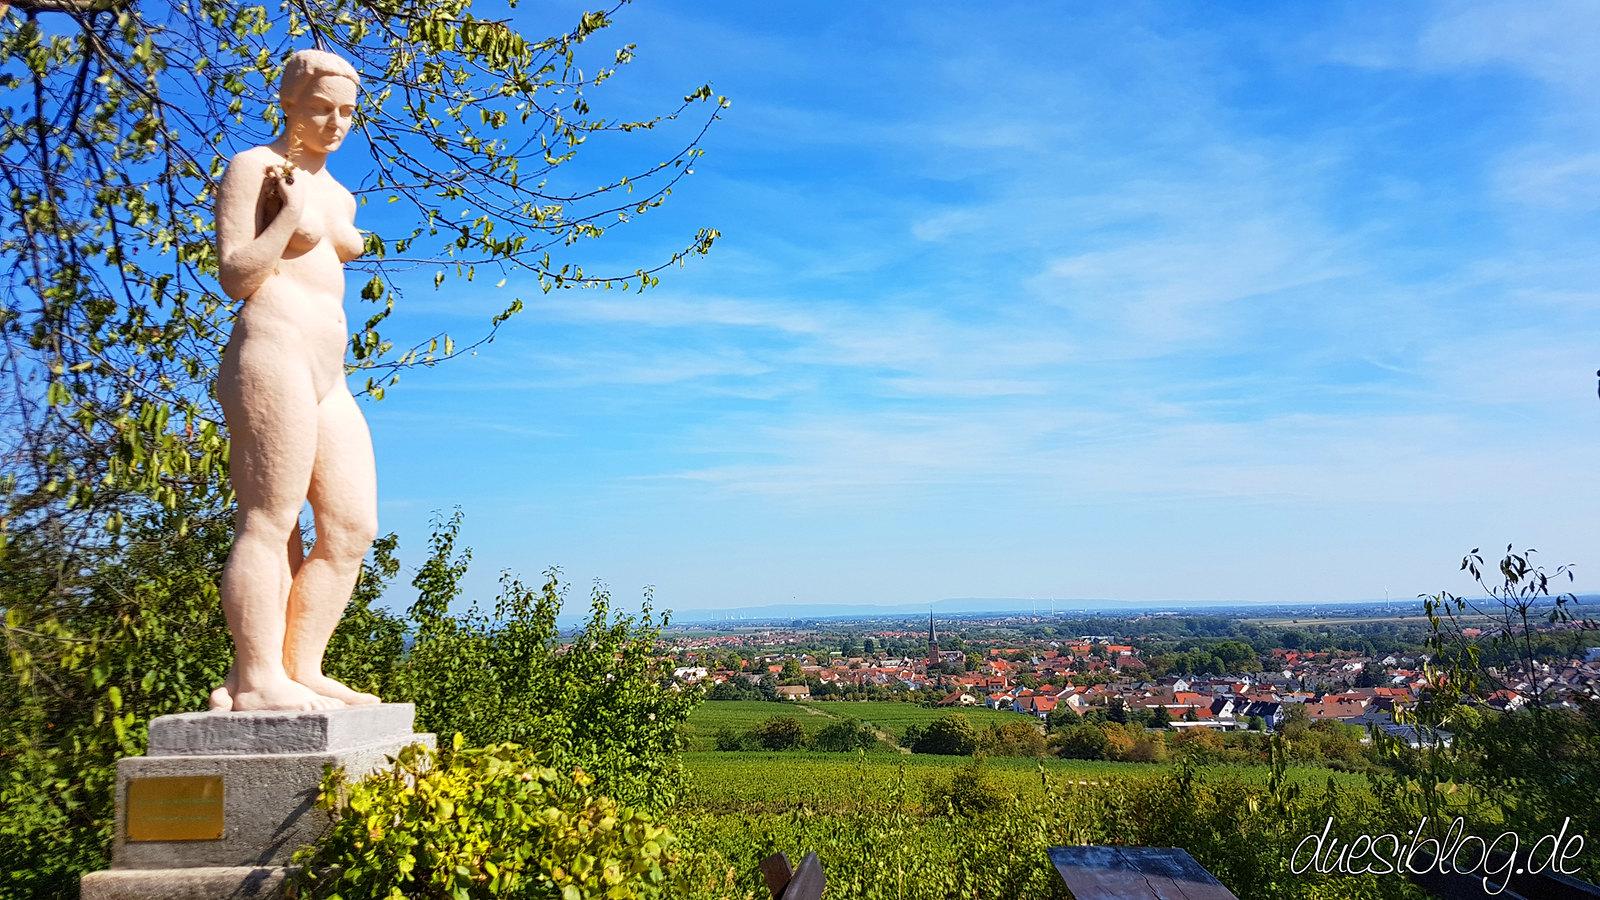 WtasO Deidesheim Paradiesgarten duesiblog travelblog 21